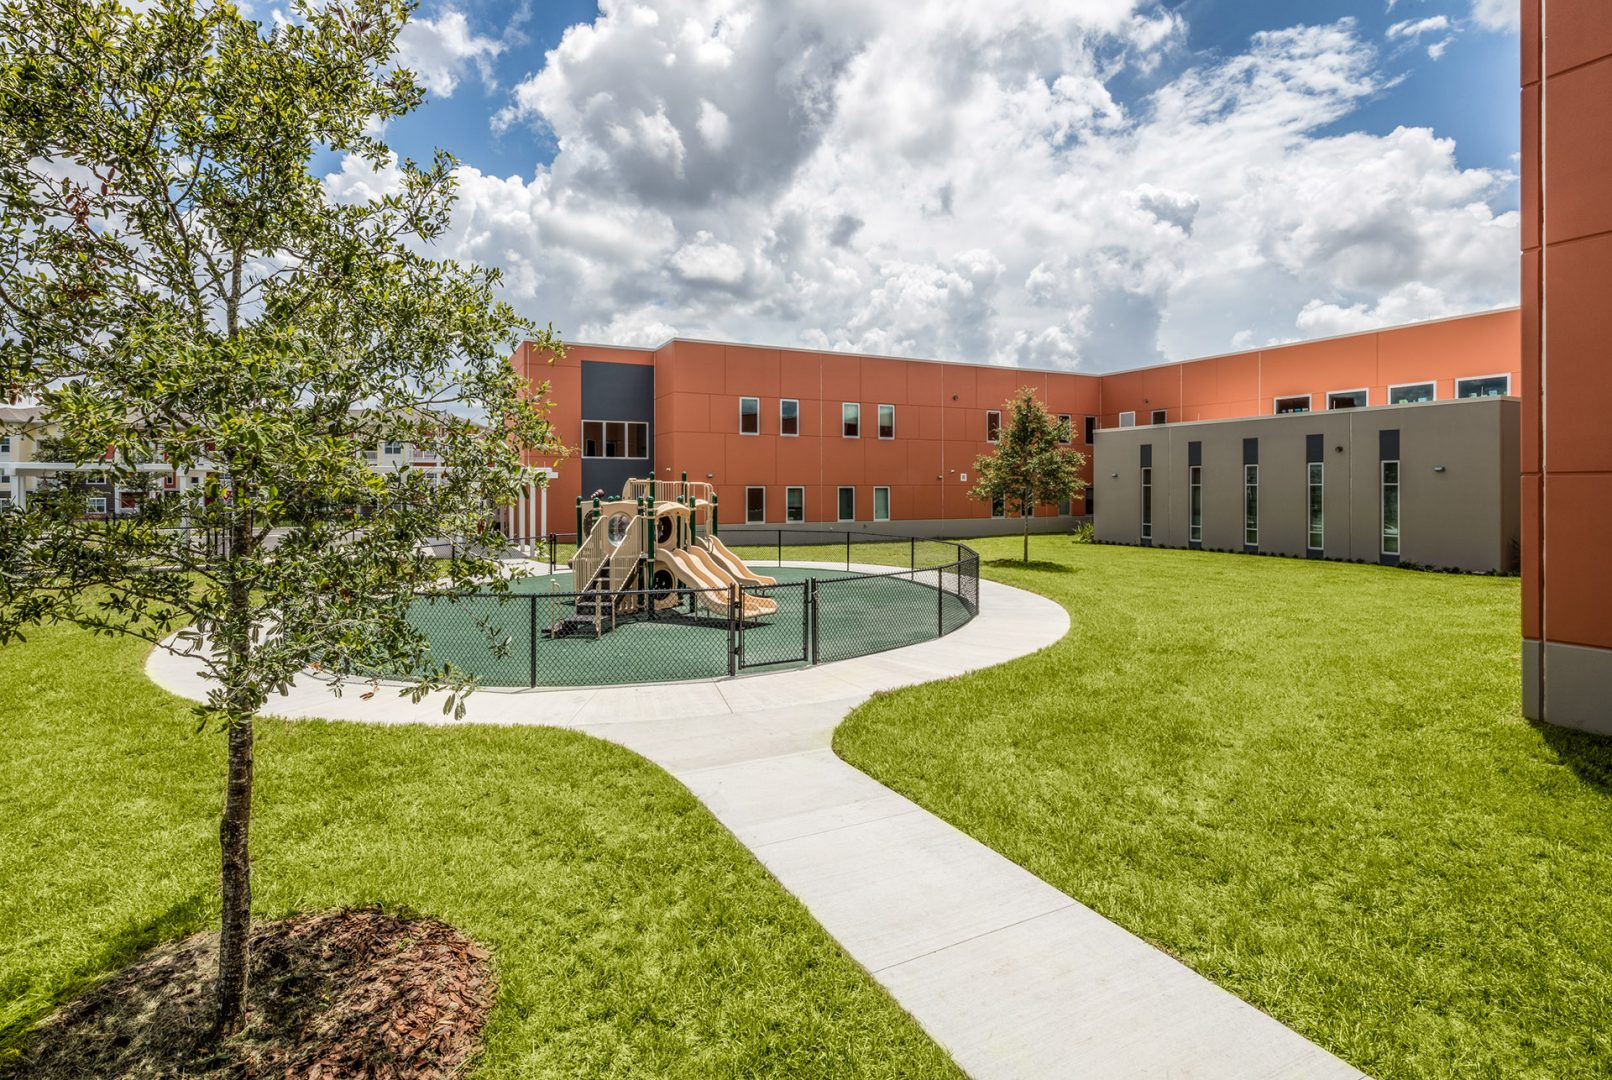 Universities In Charlotte Nc >> Millennia Gardens Elementary School | Wharton Smith, Inc.